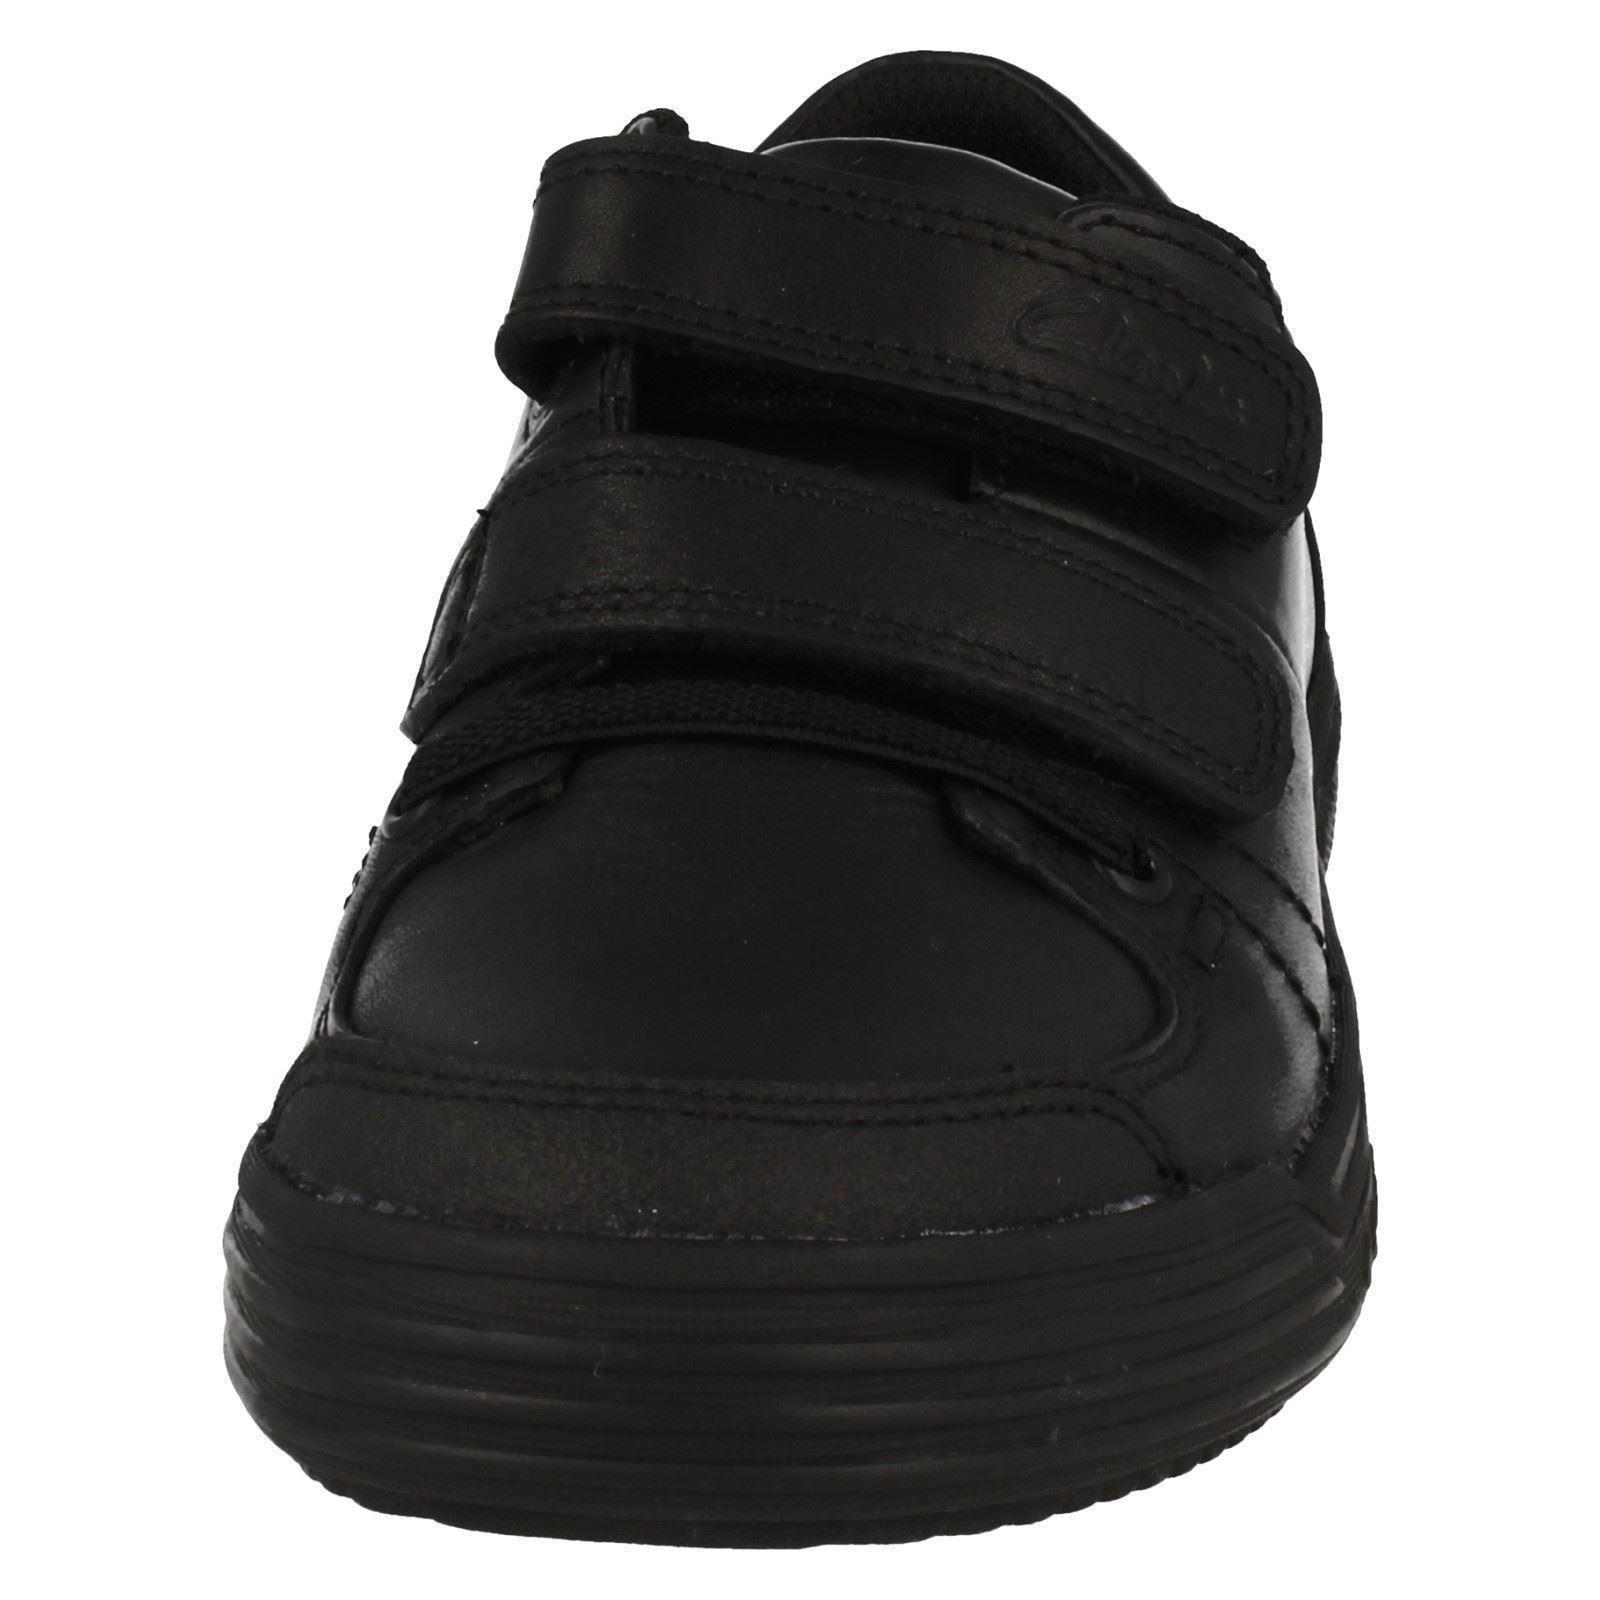 Clarks Boys Smart School Shoes Chad Racer